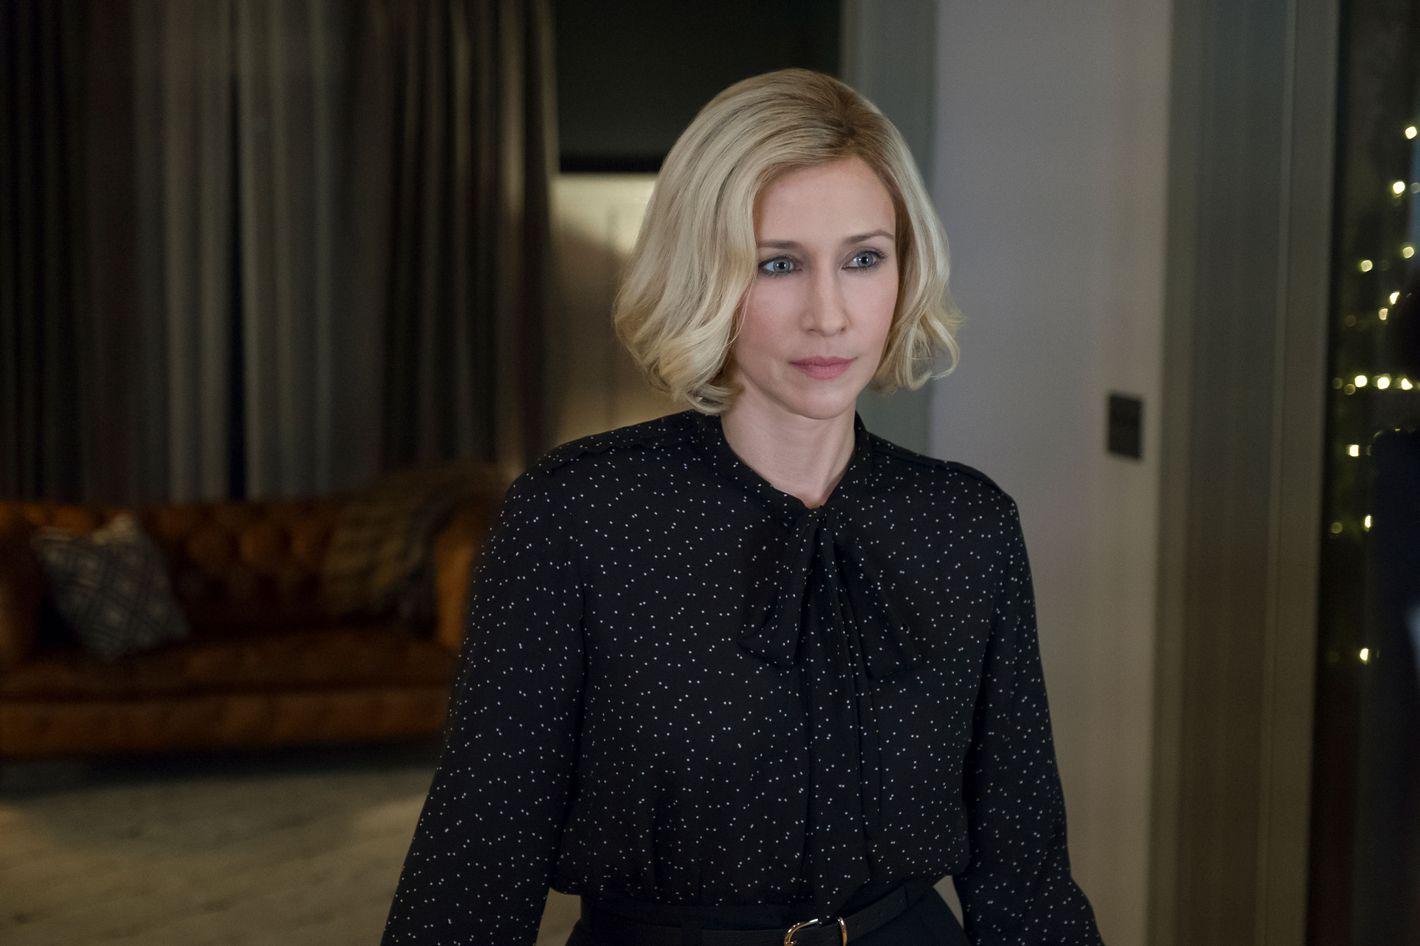 bates motel season 5 episode 4 online free